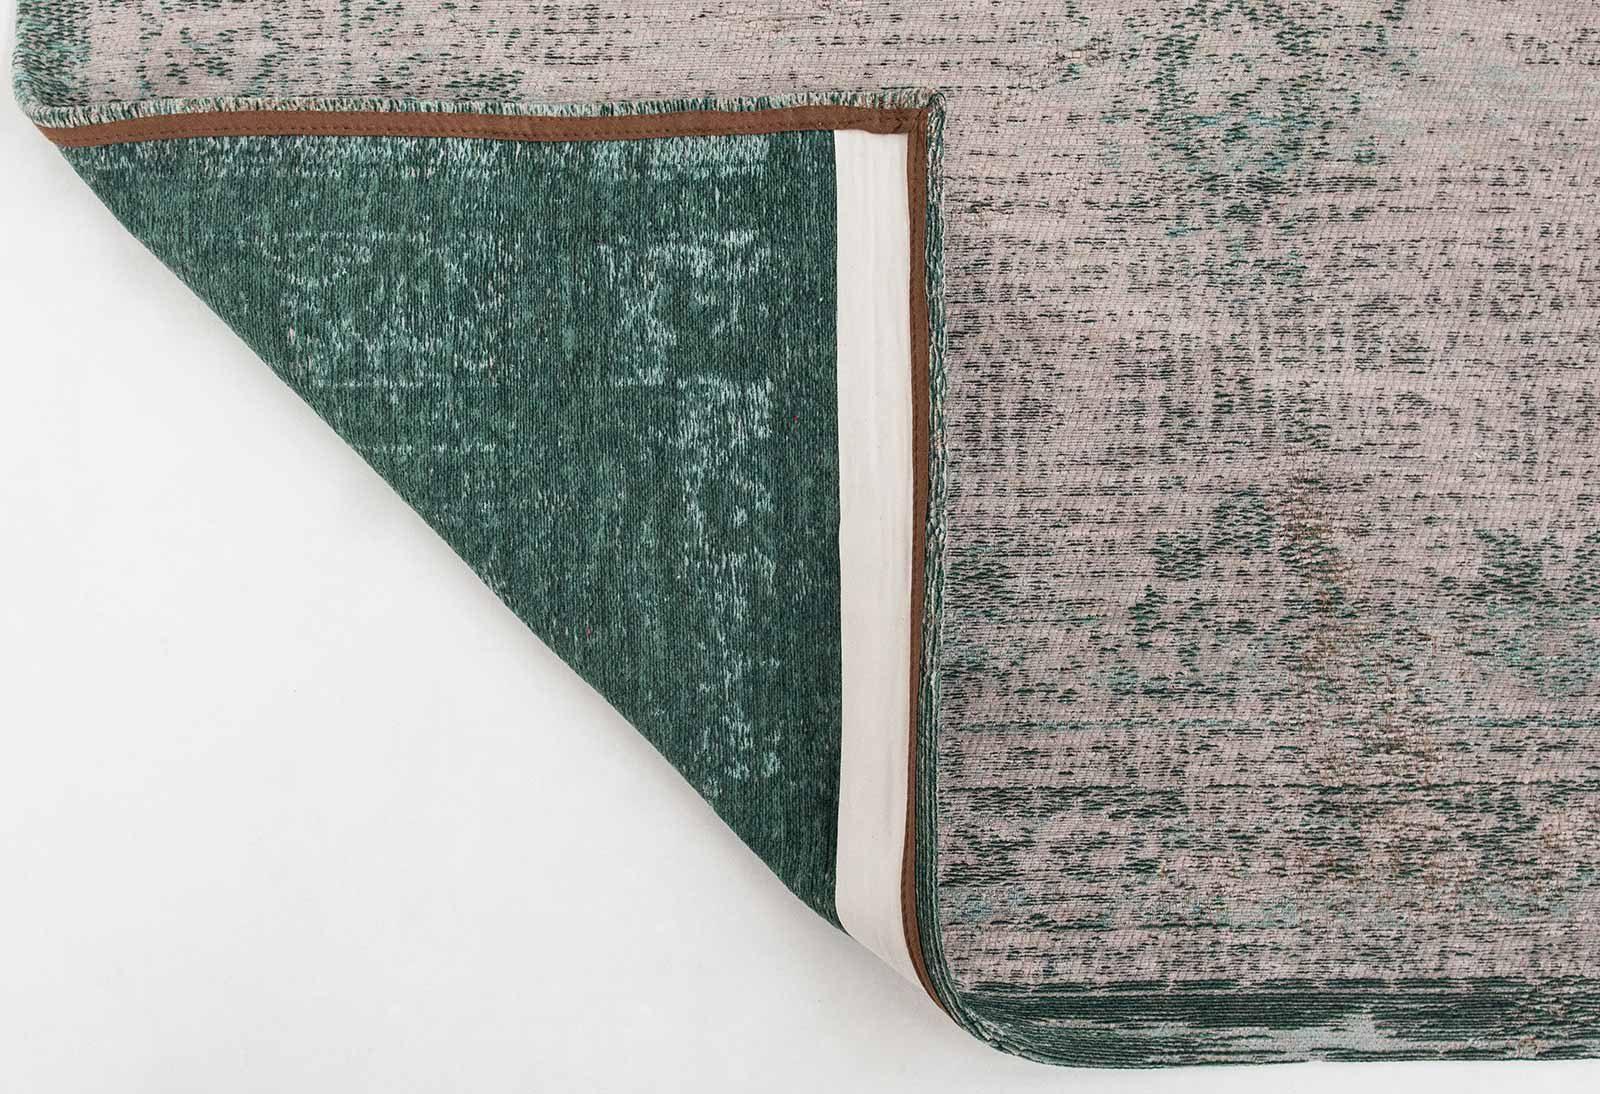 alfombras Louis De Poortere LX8259 Fading World Medaillon Jade Oyster back